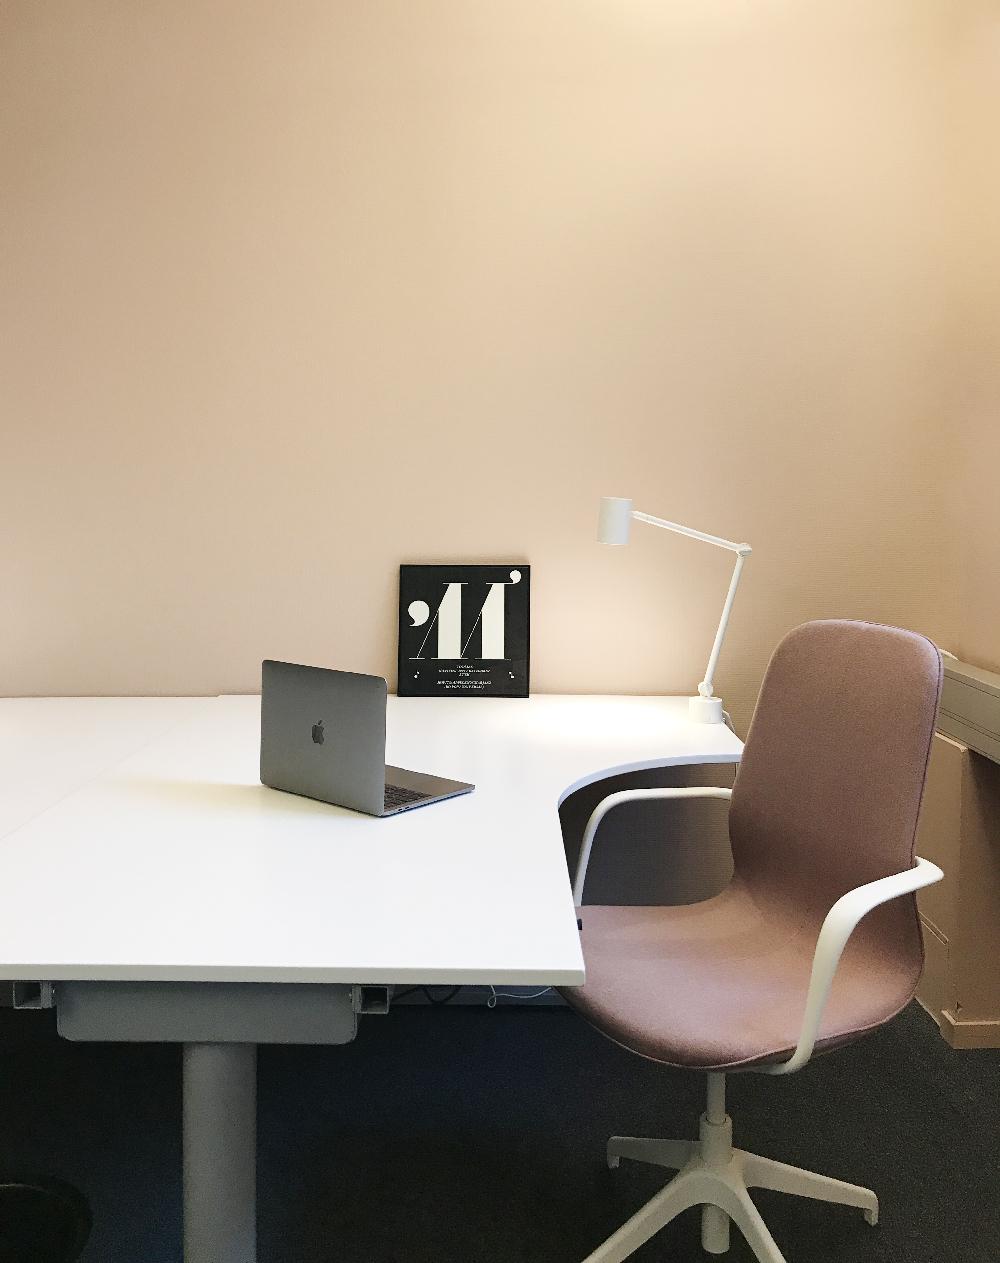 kontor_2.jpg